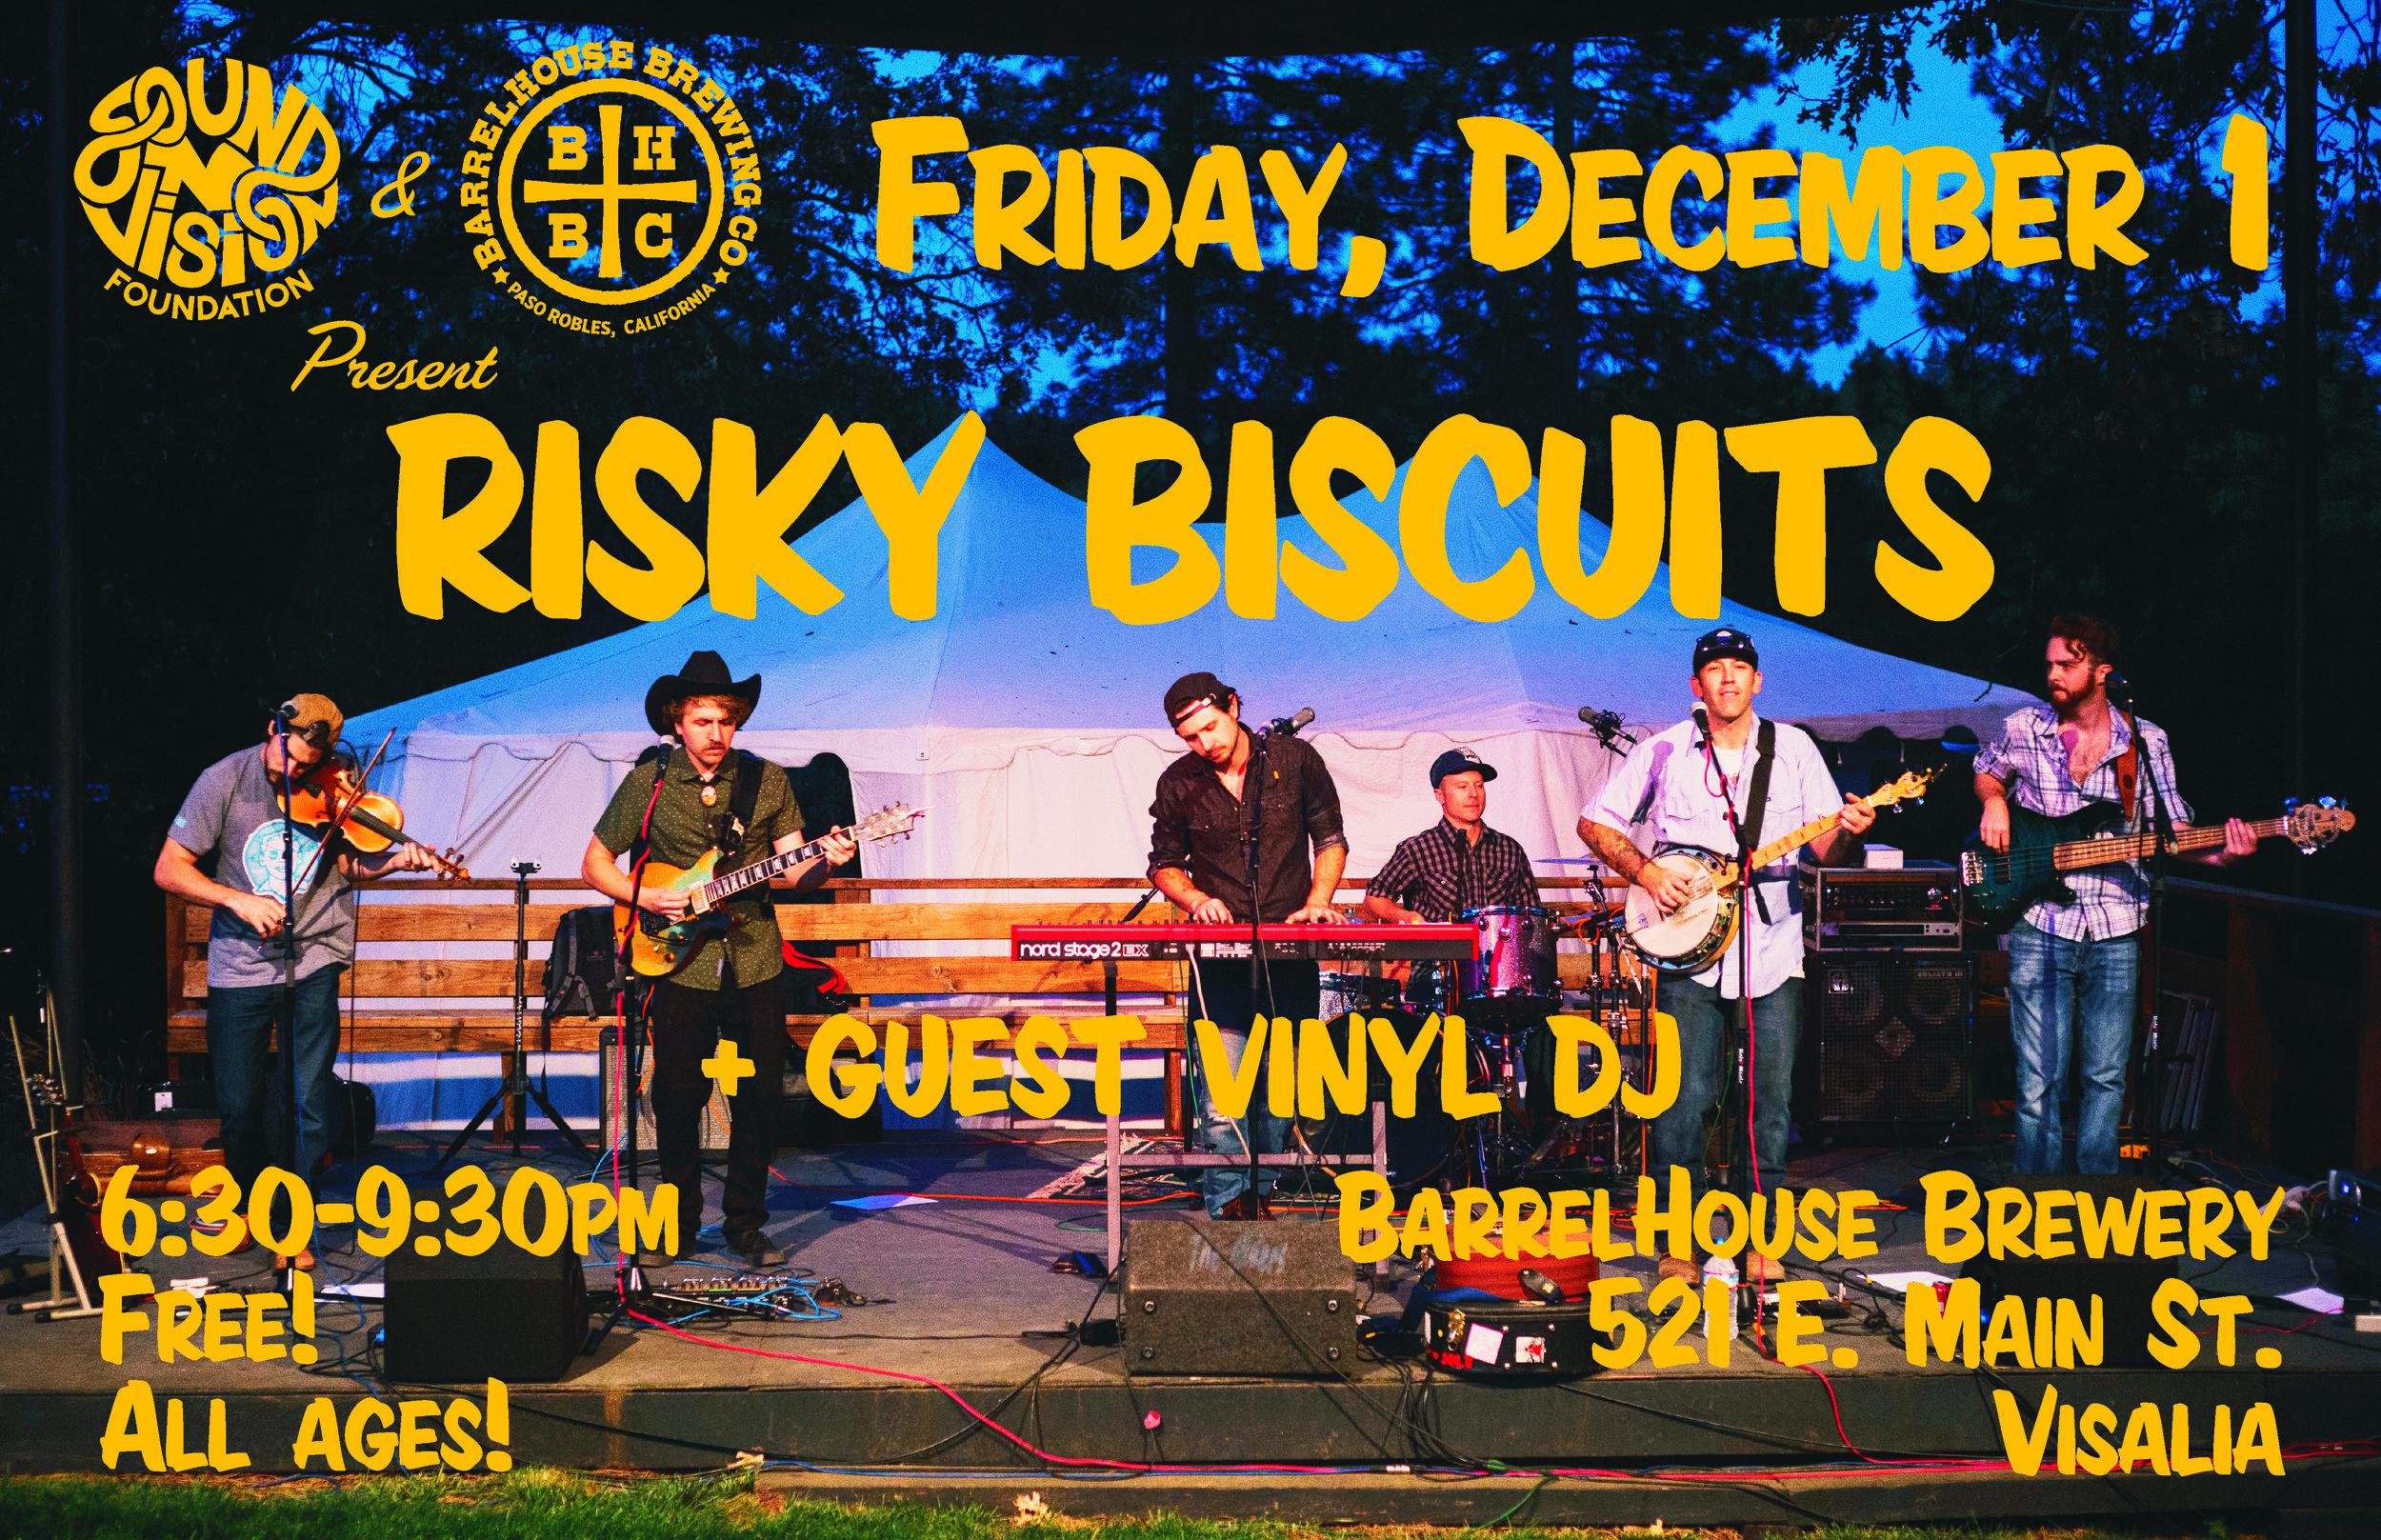 biscuits_barrelhouse.JPG